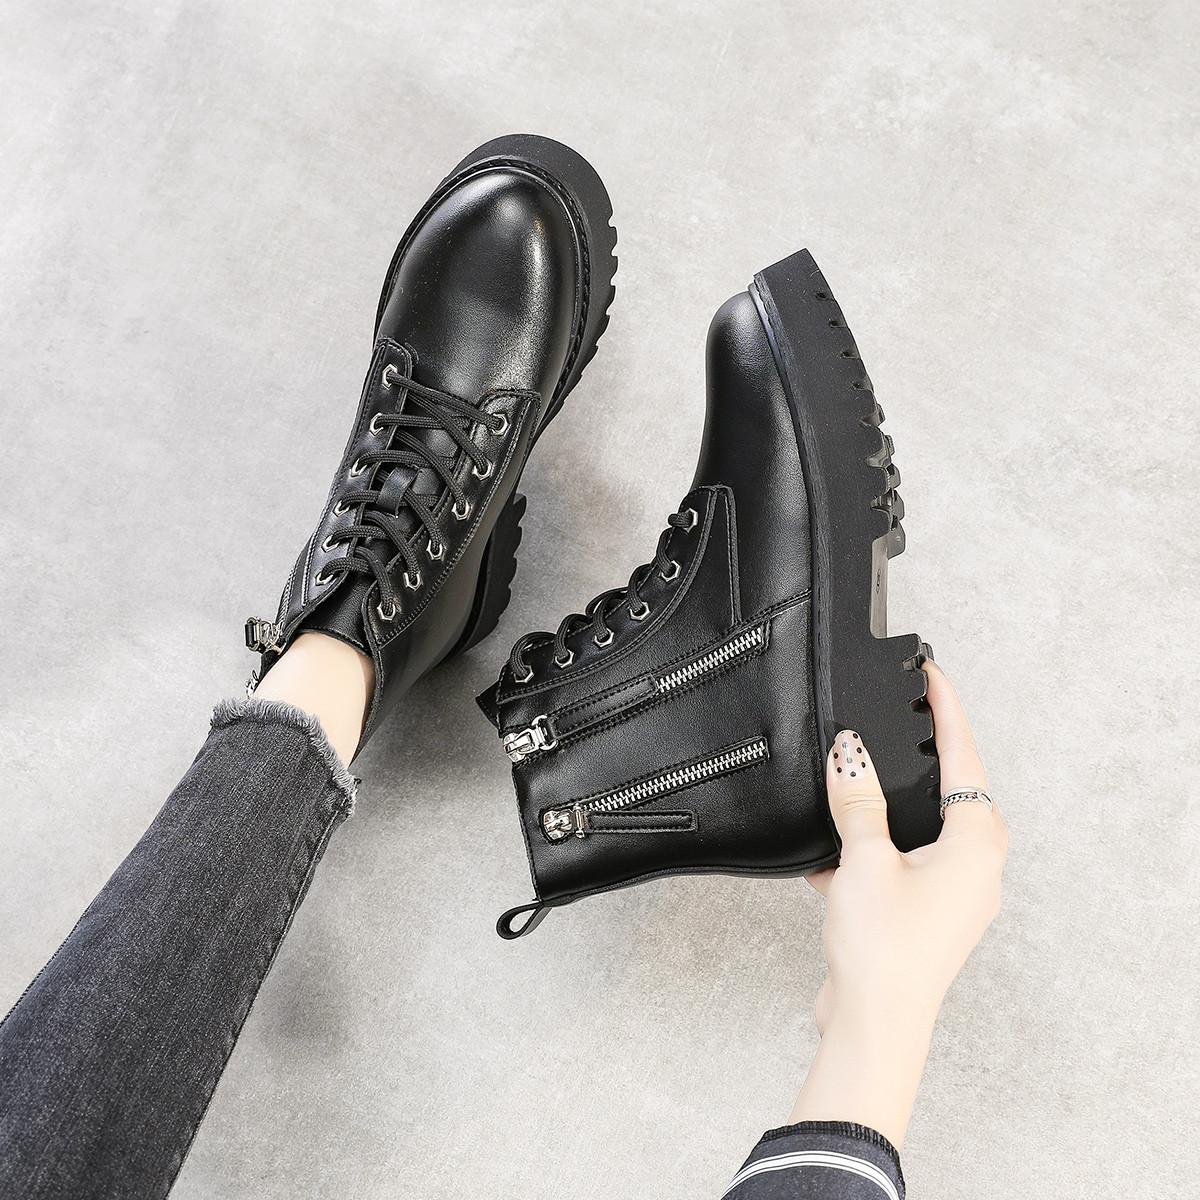 Vanssi女短靴粗跟2019冬季新款百搭学生厚底机车靴英伦风棉鞋加绒V988404096001